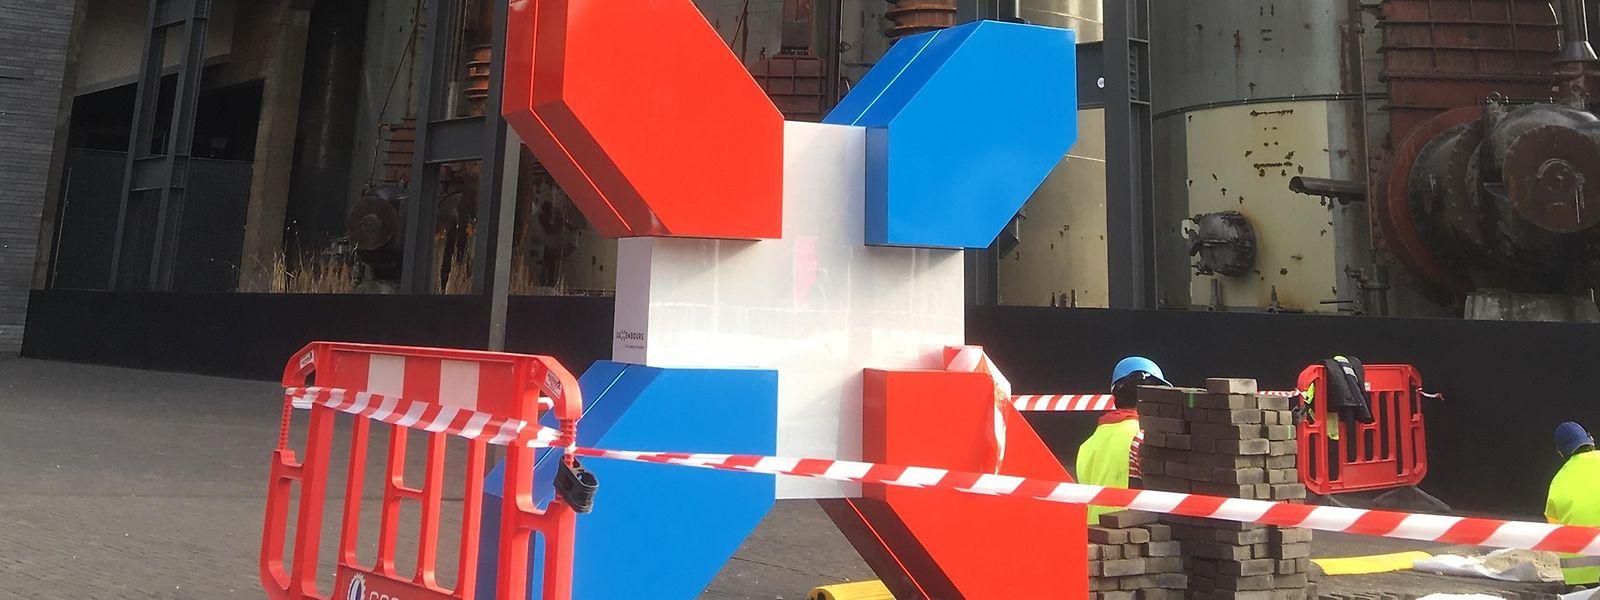 "Der Escher Bürgermeister beteuert, dass in Sachen Europäische Kulturhauptstadt derzeit ""konstruktiv gearbeitet"" werde."